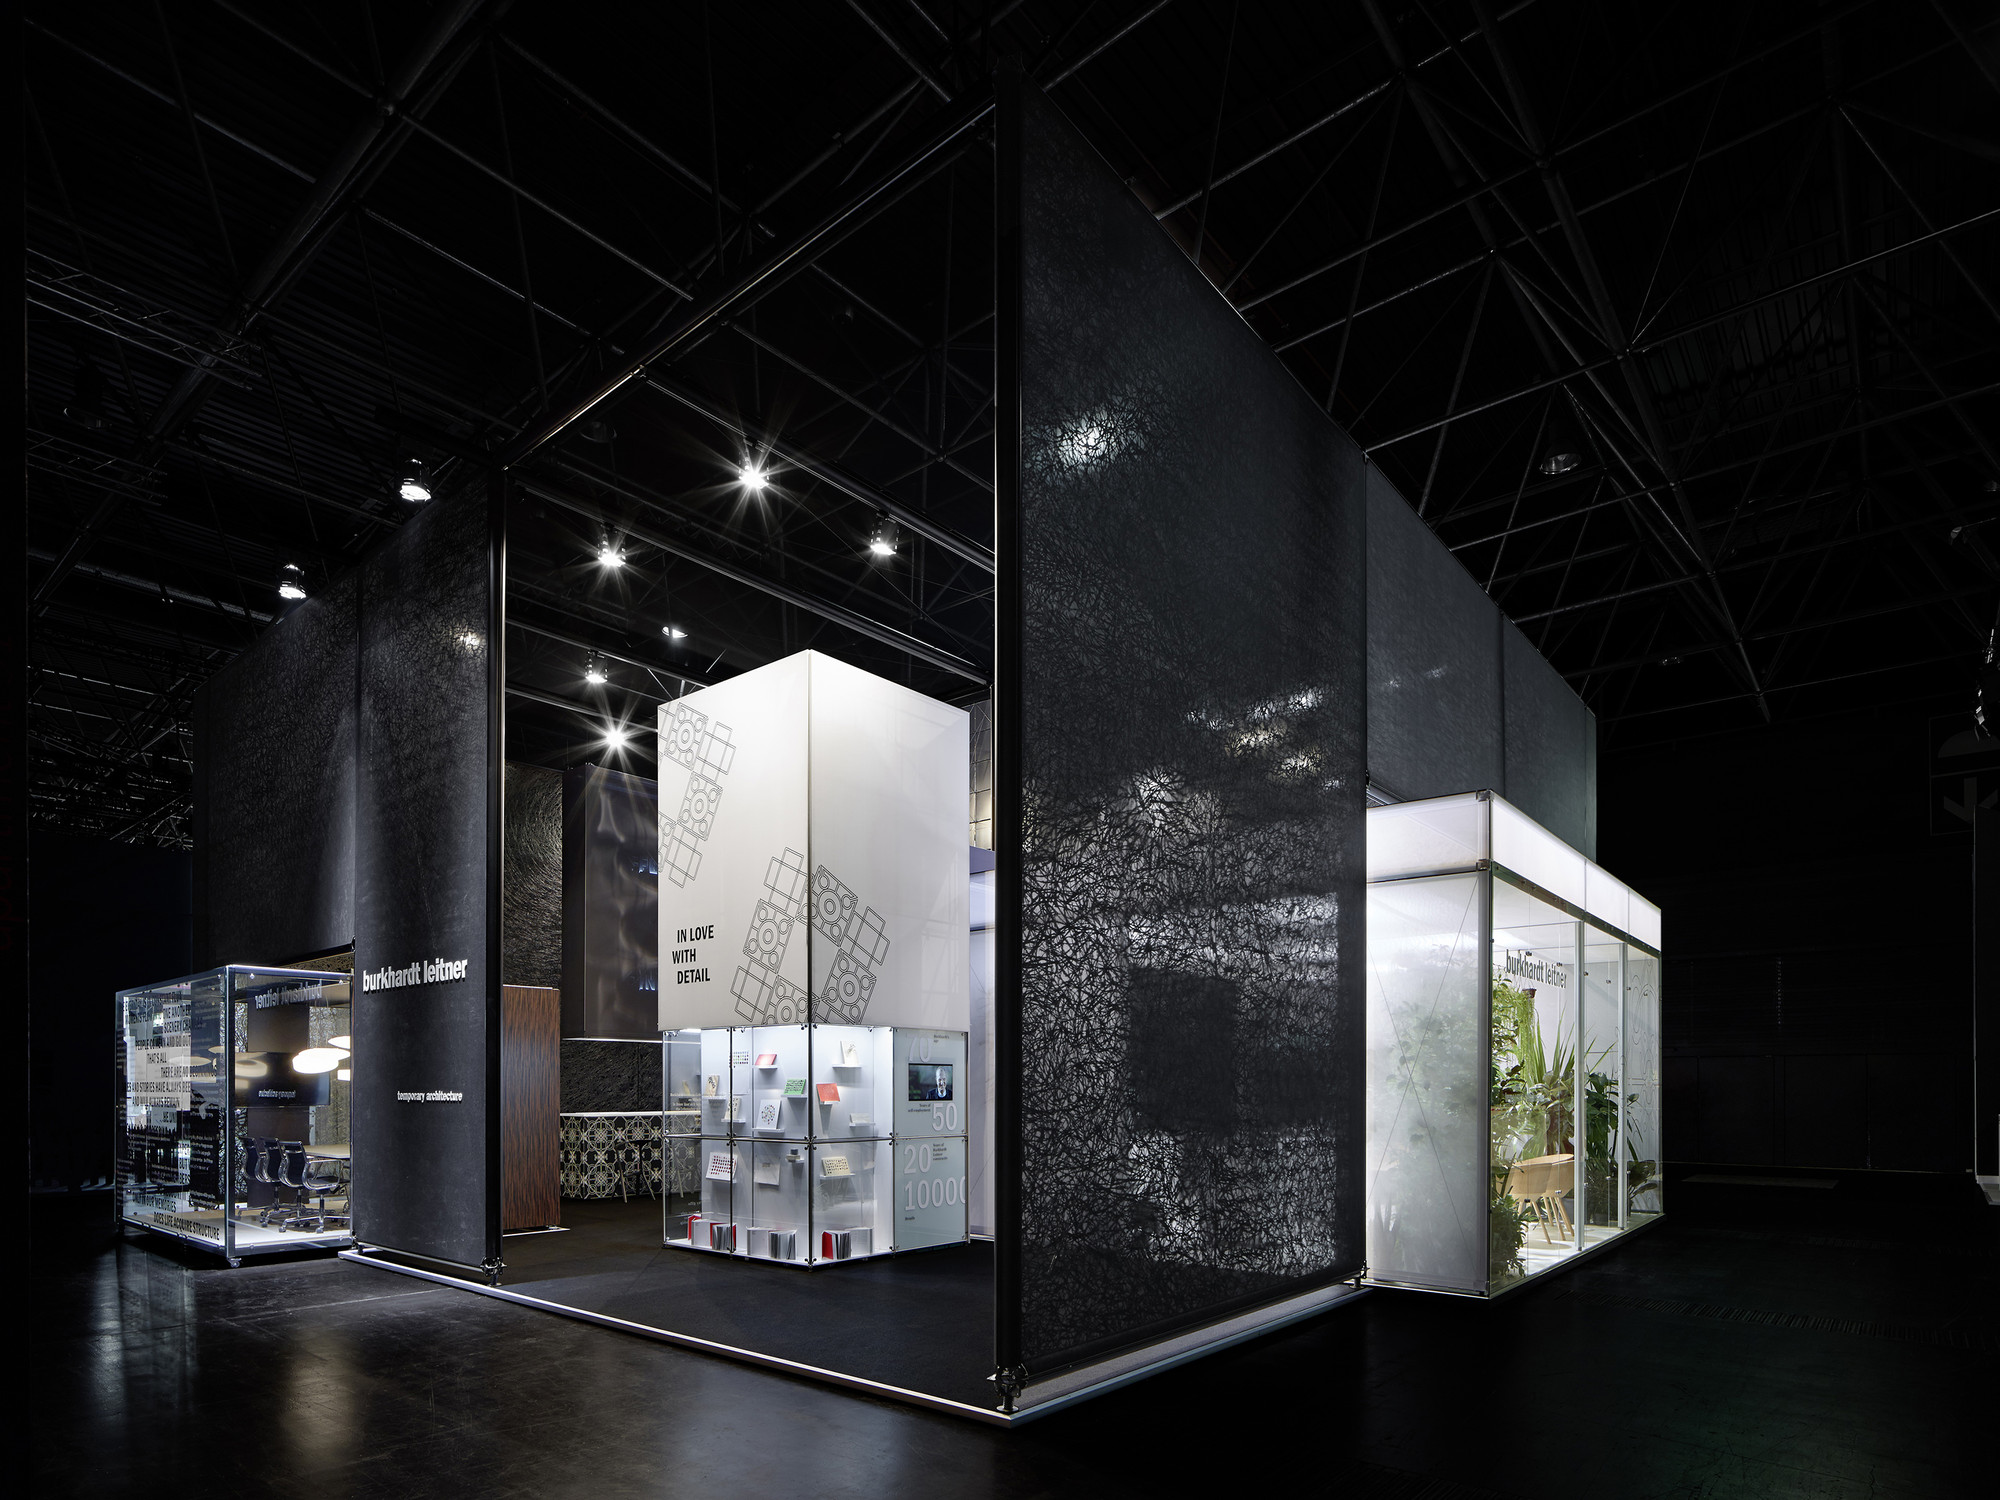 Exhibition Stand Architecture : Burkhardt leitner constructiv exhibition ippolito fleitz group